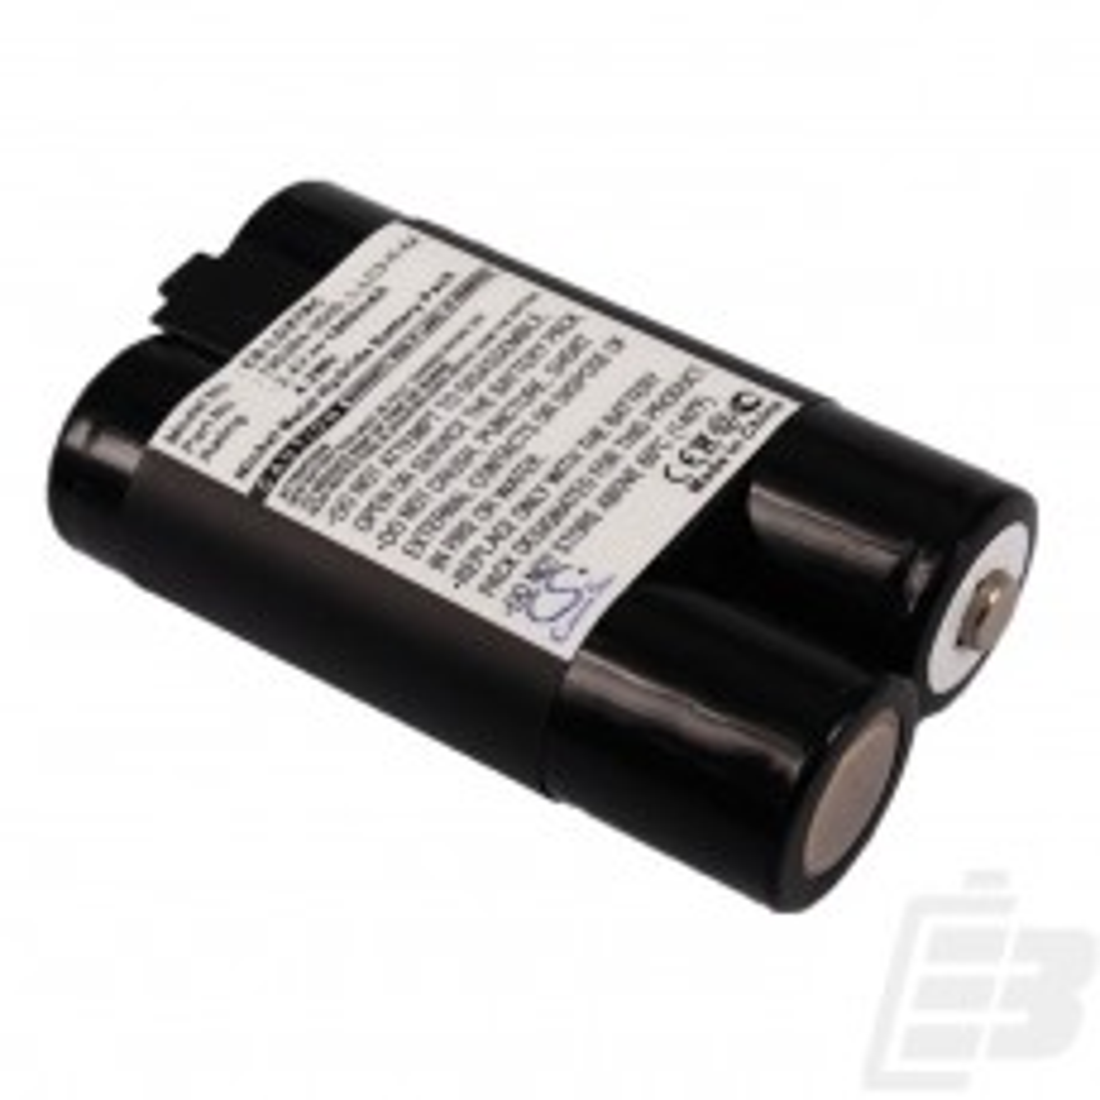 Wireless mouse battery Logitech LX700_1